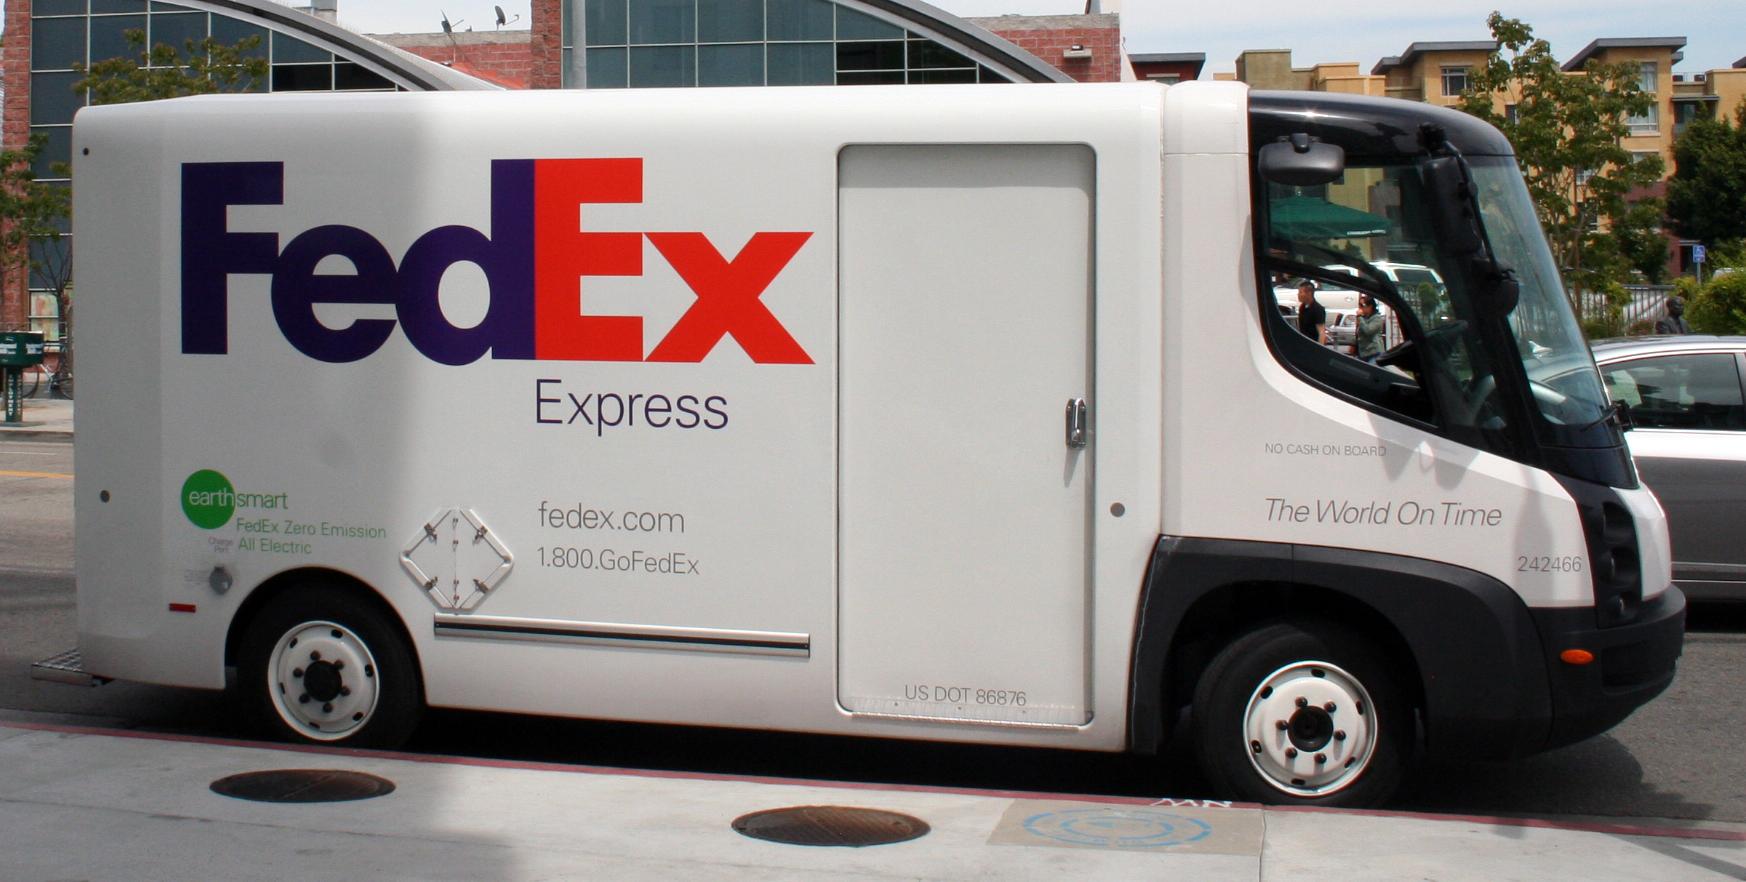 The Van Lounge News: USPS is looking for a few good vans    like